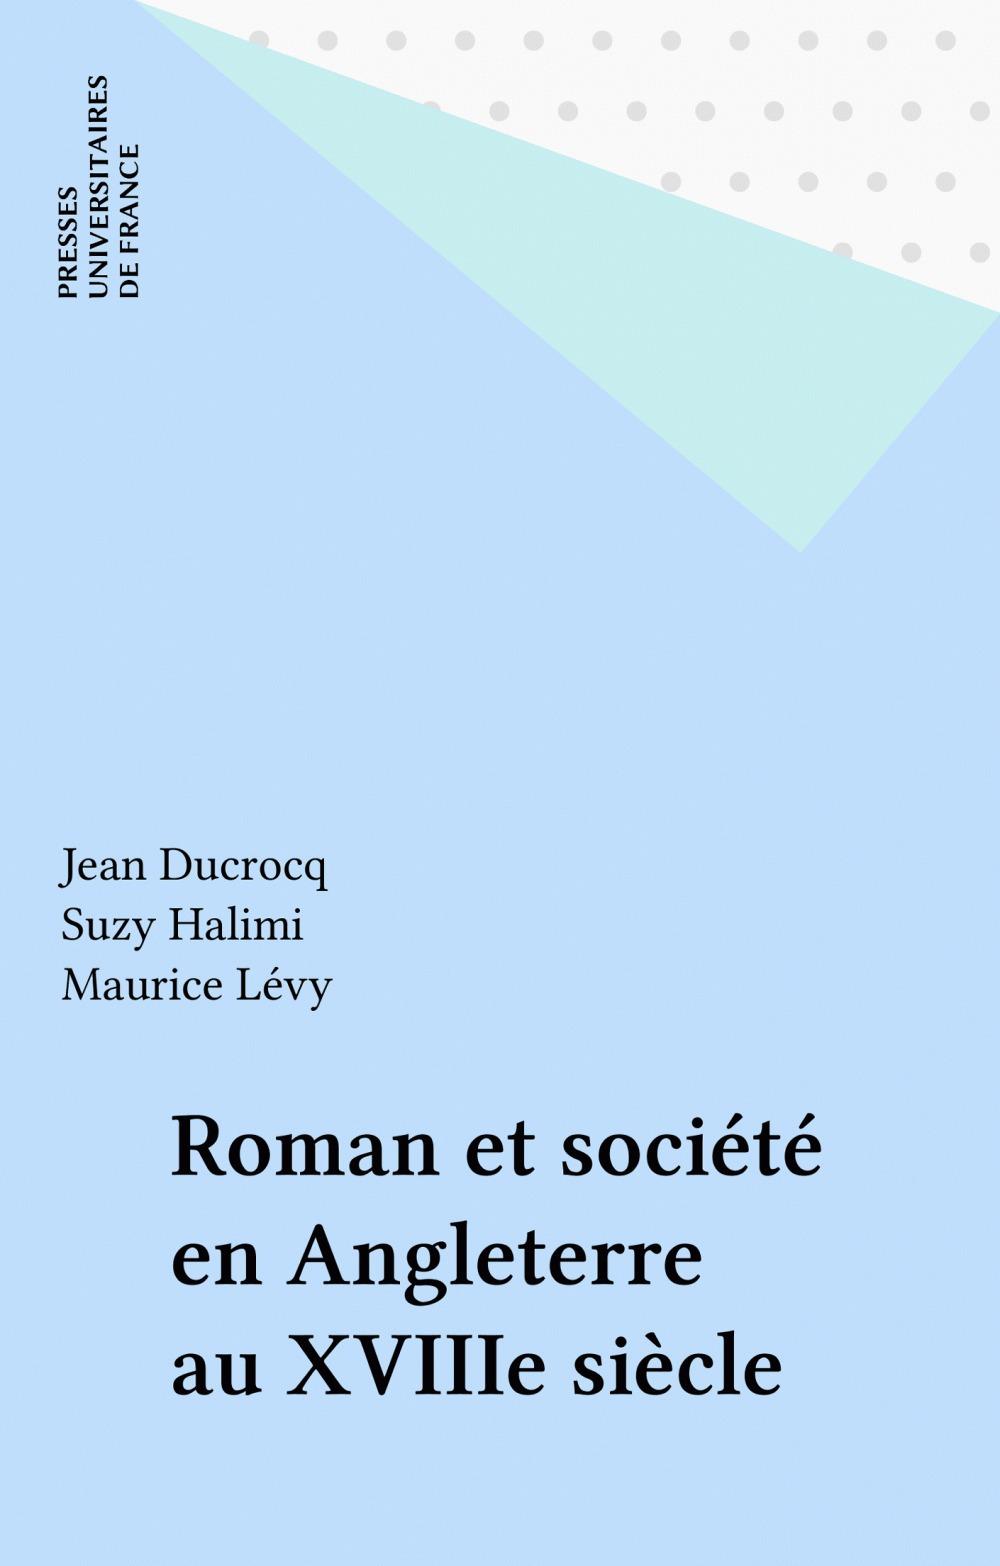 Roman et societe en angleterre au xviiie siecle